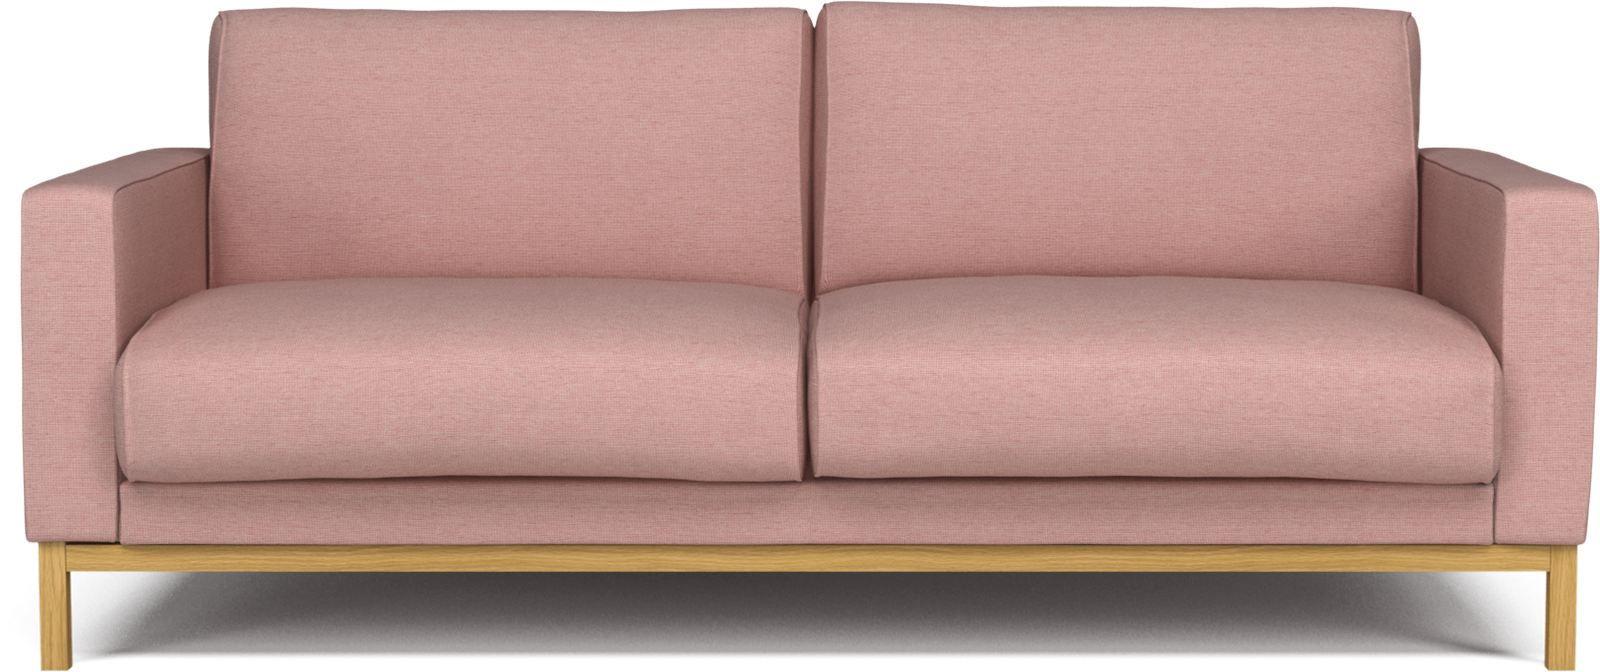 North 2½ pers. sofa